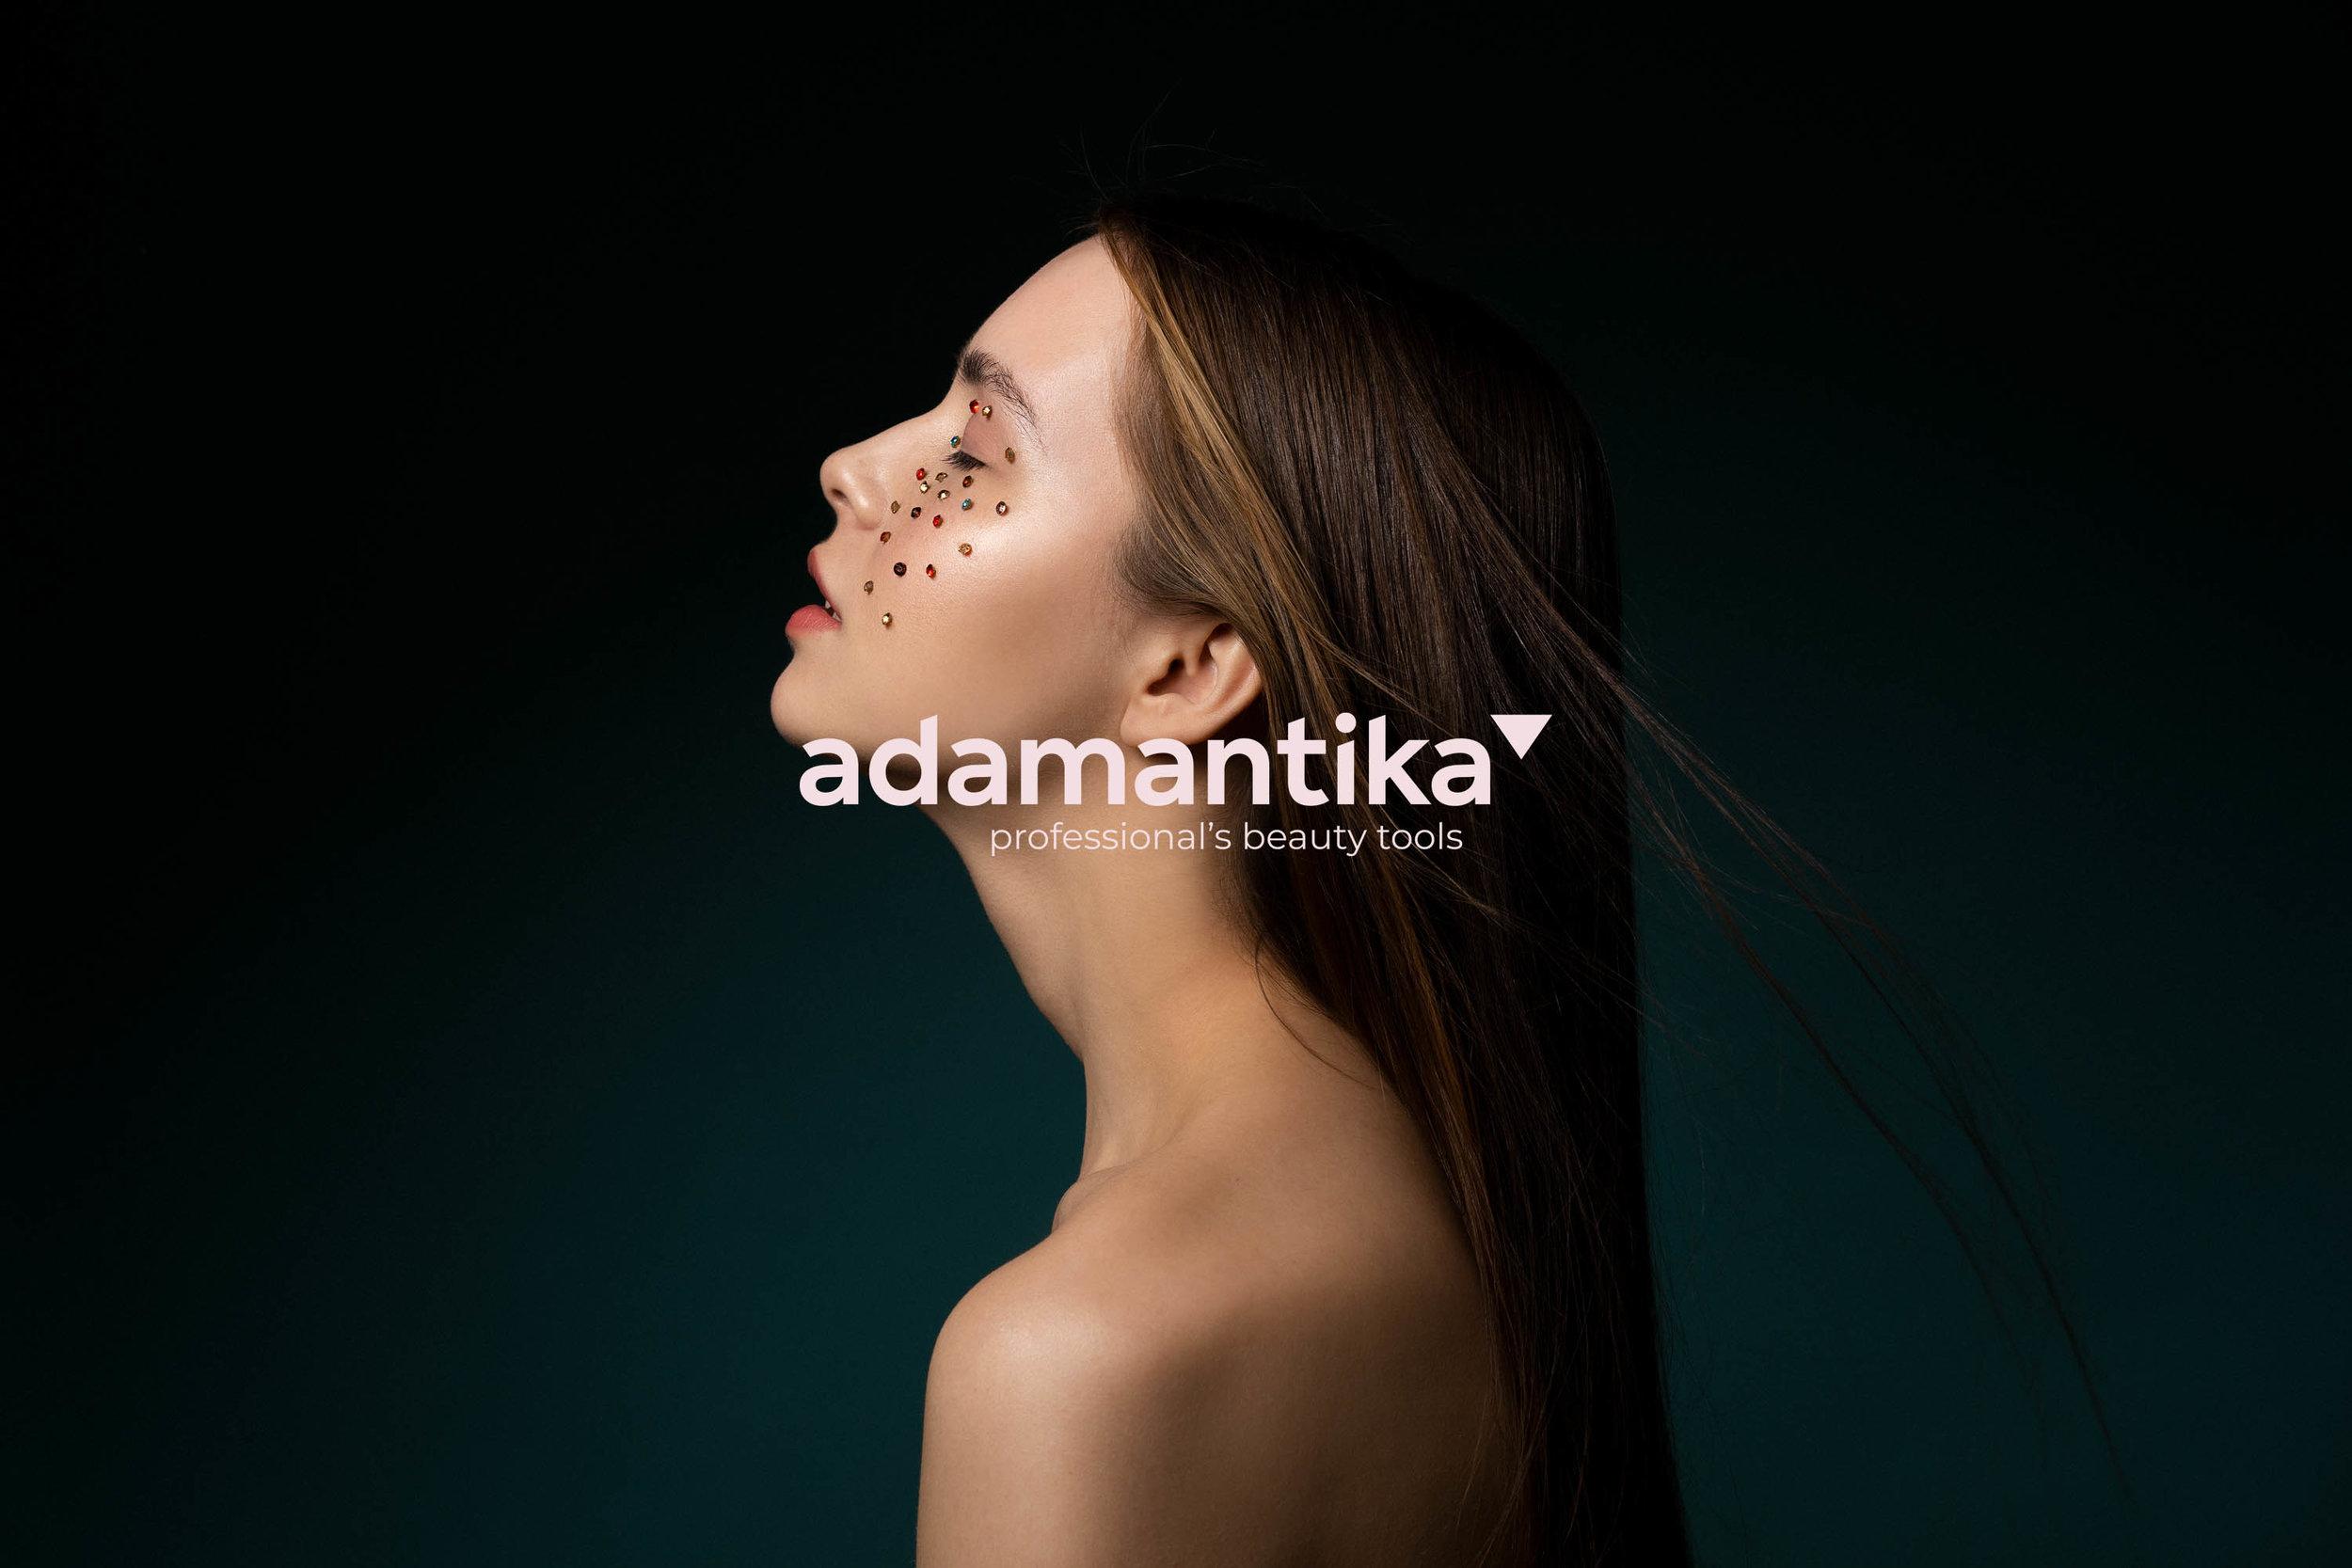 06.-adamantika.jpg